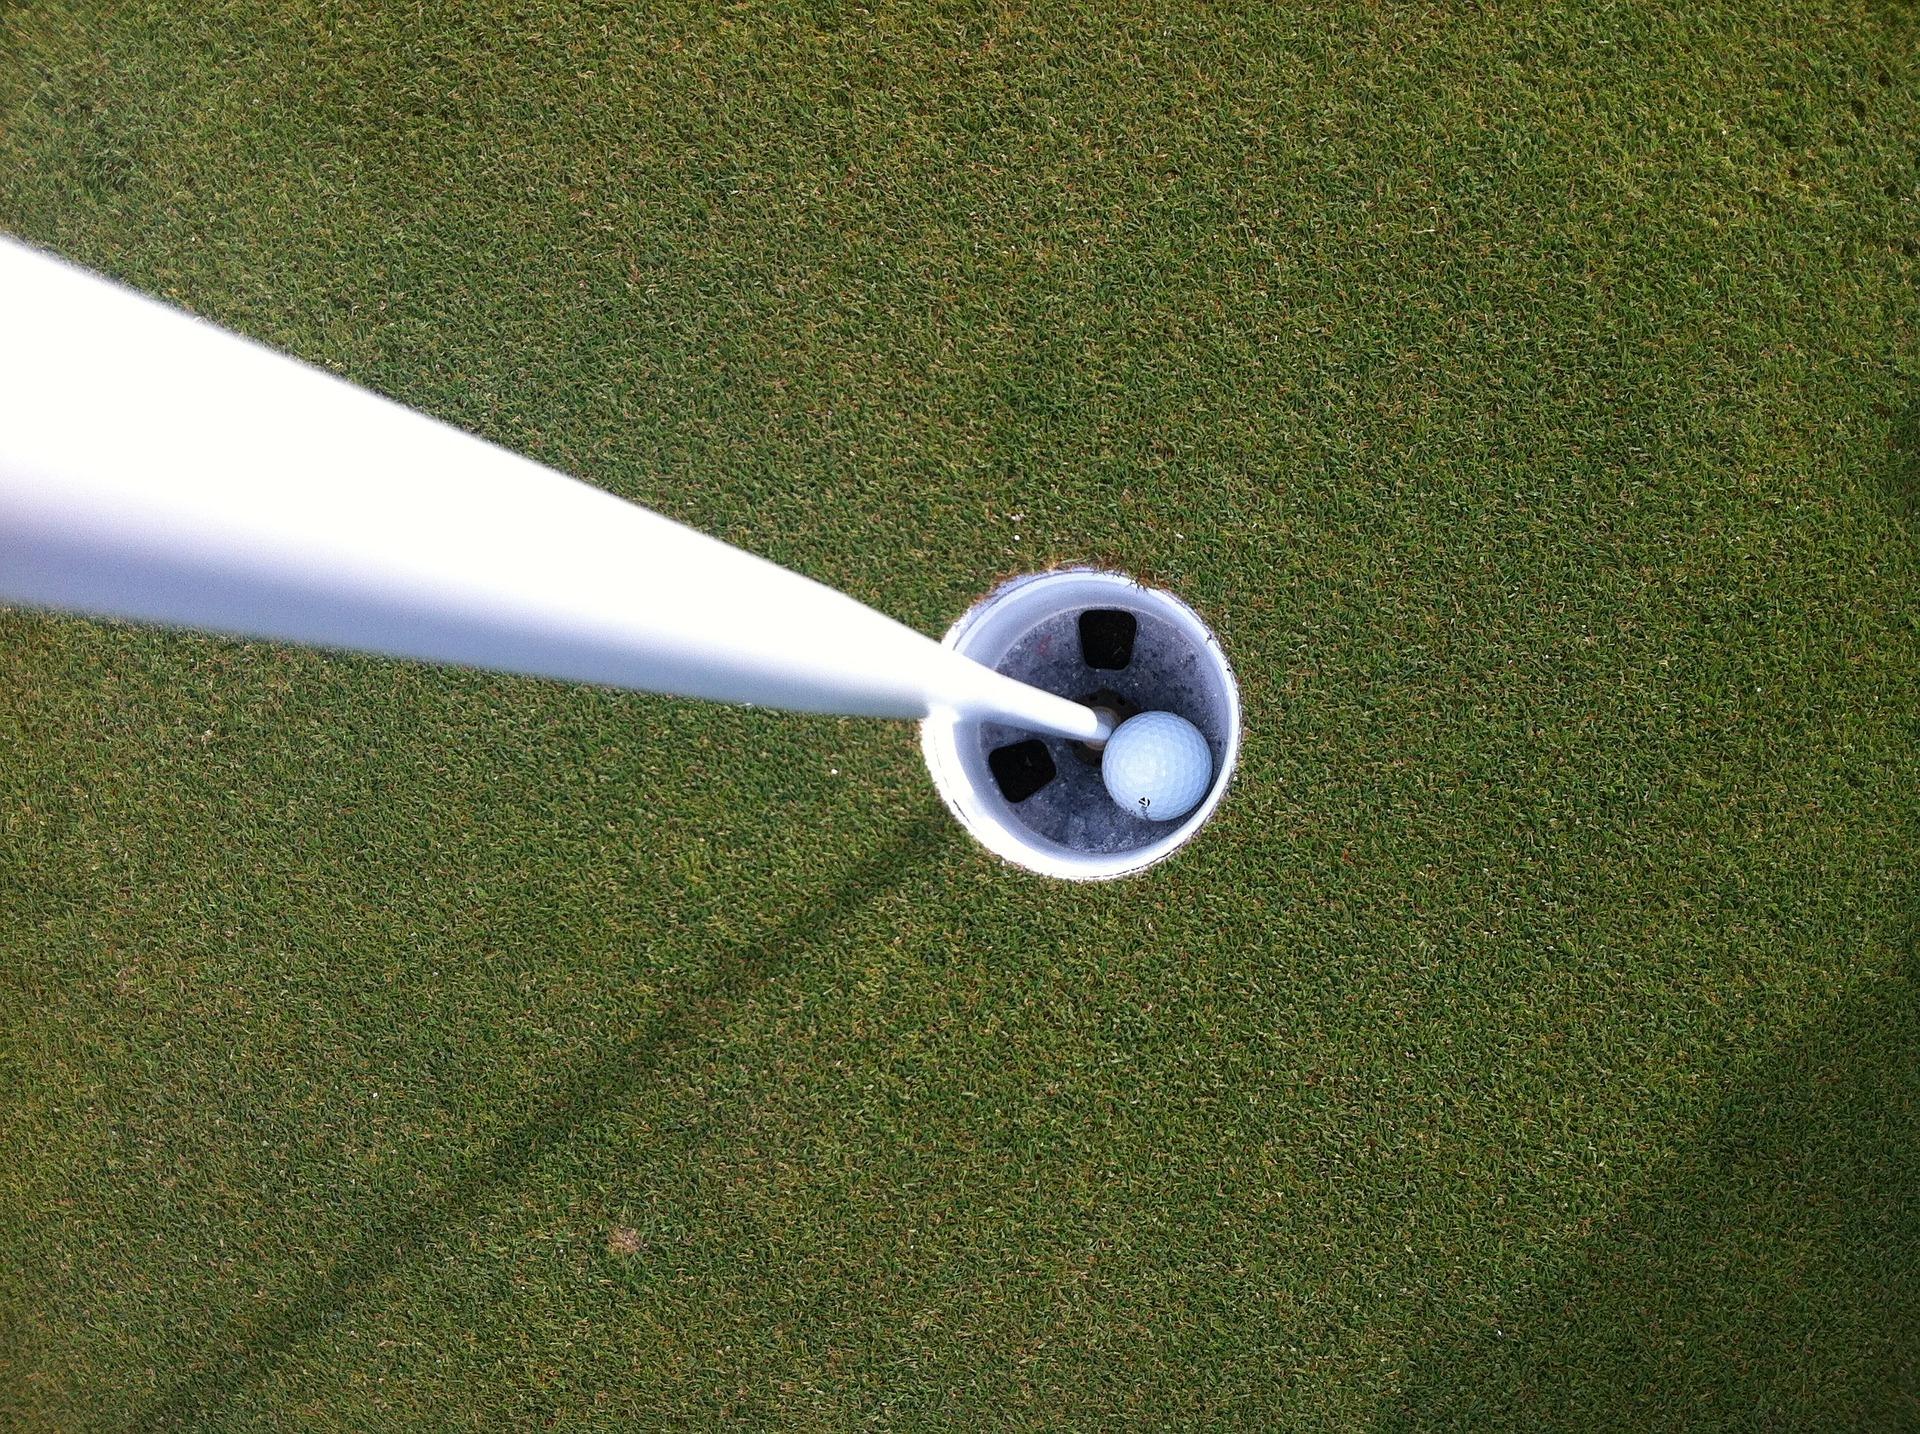 golf-1170716_1920.jpg